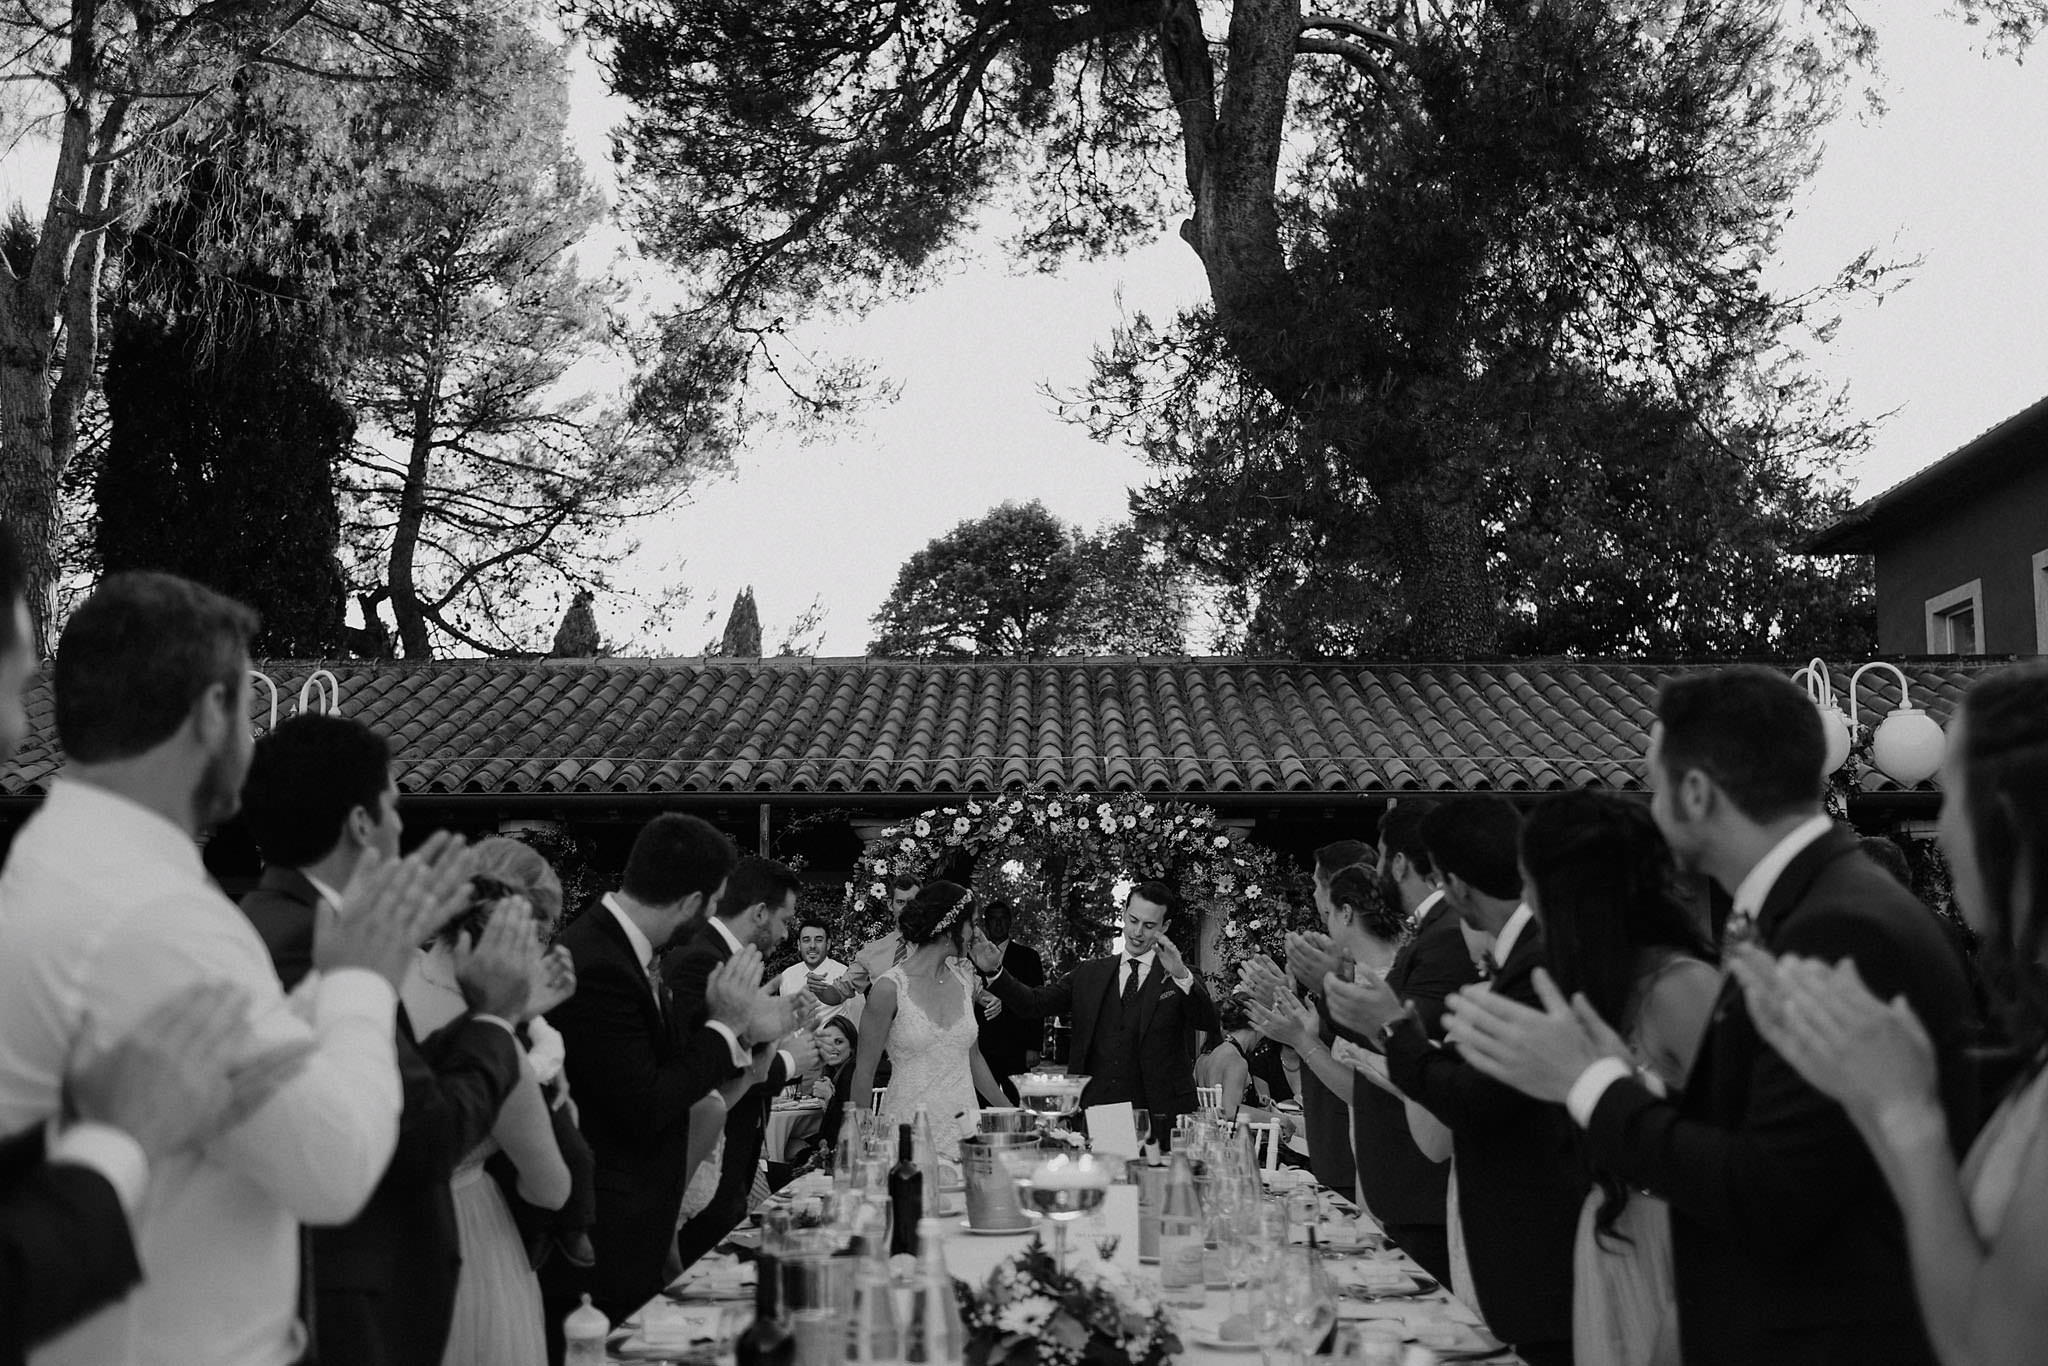 Max-Steph-Italy-Wedding-569.jpg